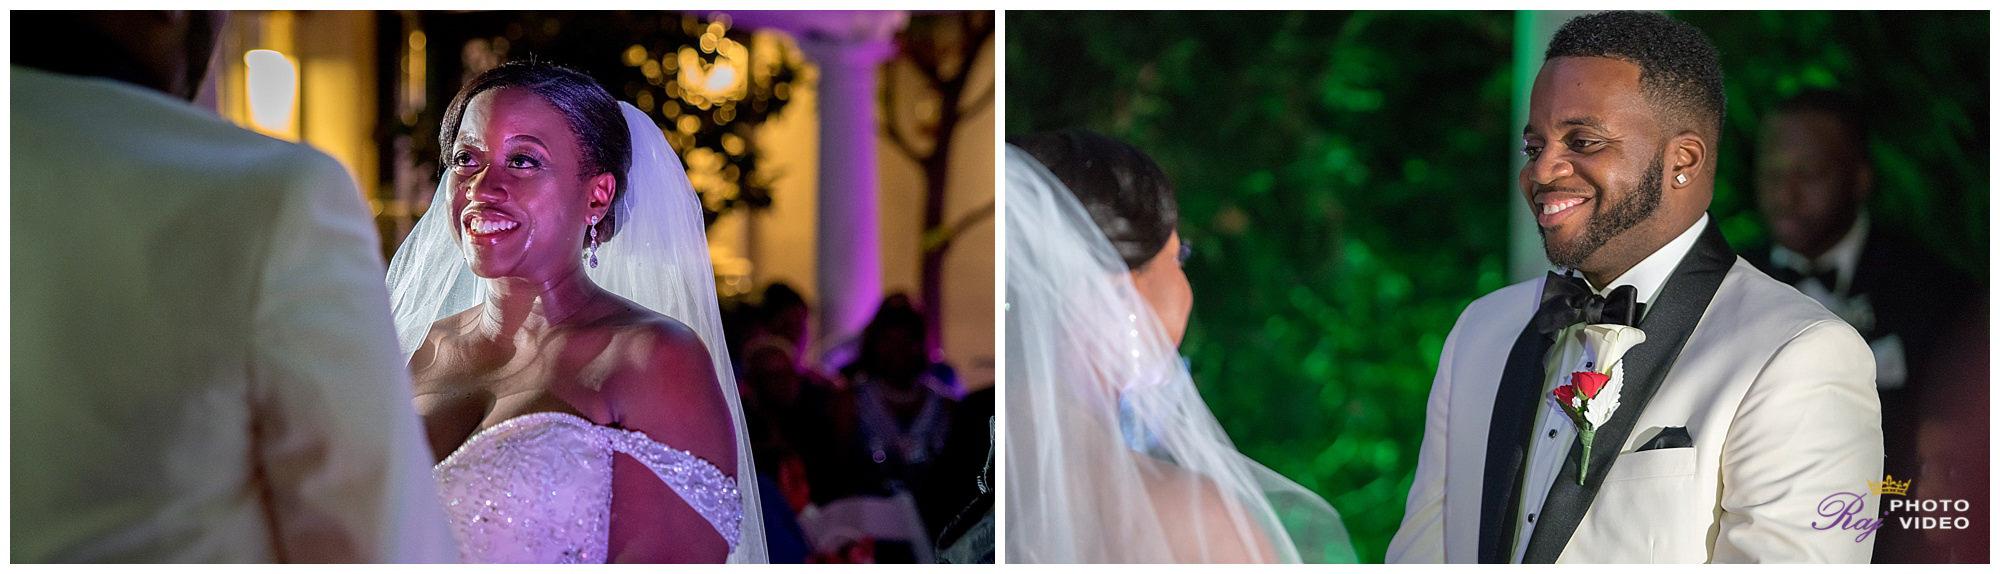 Royal_Manor_Garfield_NJ_Christian_Wedding_Jade_Scott-0009.jpg